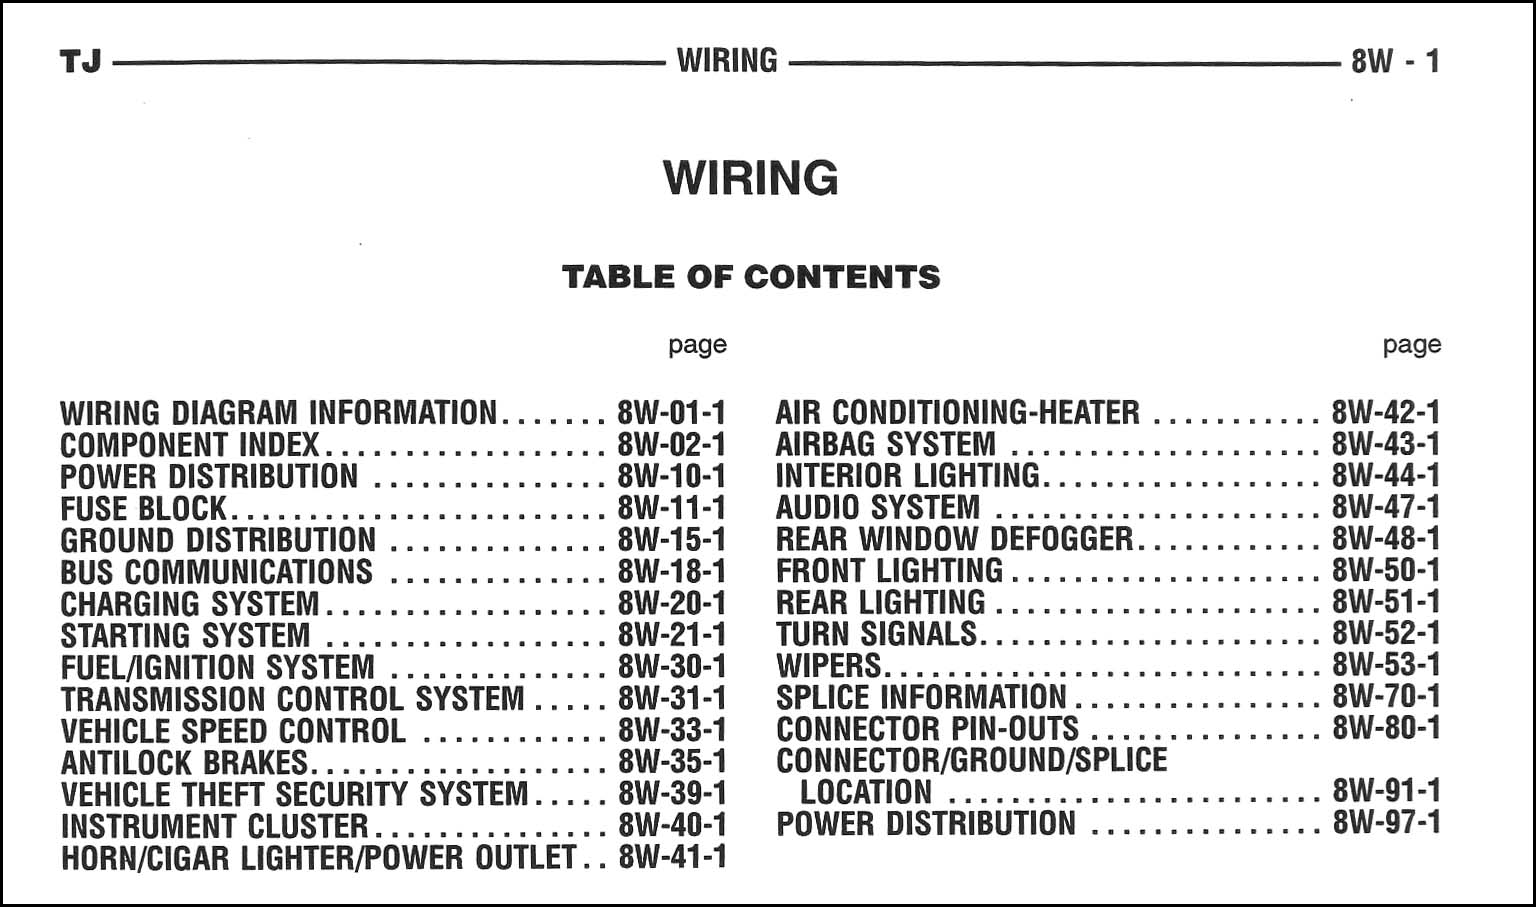 Wiring Diagram For 2005 Jeep Wrangler - 2.xeghaqqt.chrisblacksbio.info on 2000 nissan xterra wiring harness, 2005 jeep wrangler wiring harness, 1997 jeep grand cherokee wiring harness, 2000 jeep grand cherokee wiring harness, 2002 jeep grand cherokee wiring harness, 2000 chevrolet blazer wiring harness, 2000 vw passat wiring harness, 2000 kia sportage wiring harness, 1991 jeep wrangler wiring harness, 2000 jeep wrangler horn wiring, jeep transmission wiring harness, 1993 jeep wrangler wiring harness, 1994 jeep wrangler wiring harness, 2001 jeep grand cherokee wiring harness, 2004 jeep grand cherokee wiring harness, 2006 jeep wrangler wiring harness, 1988 jeep wrangler wiring harness, 2007 jeep wrangler wiring harness, 1998 jeep grand cherokee wiring harness, 2002 jeep wrangler wiring harness,